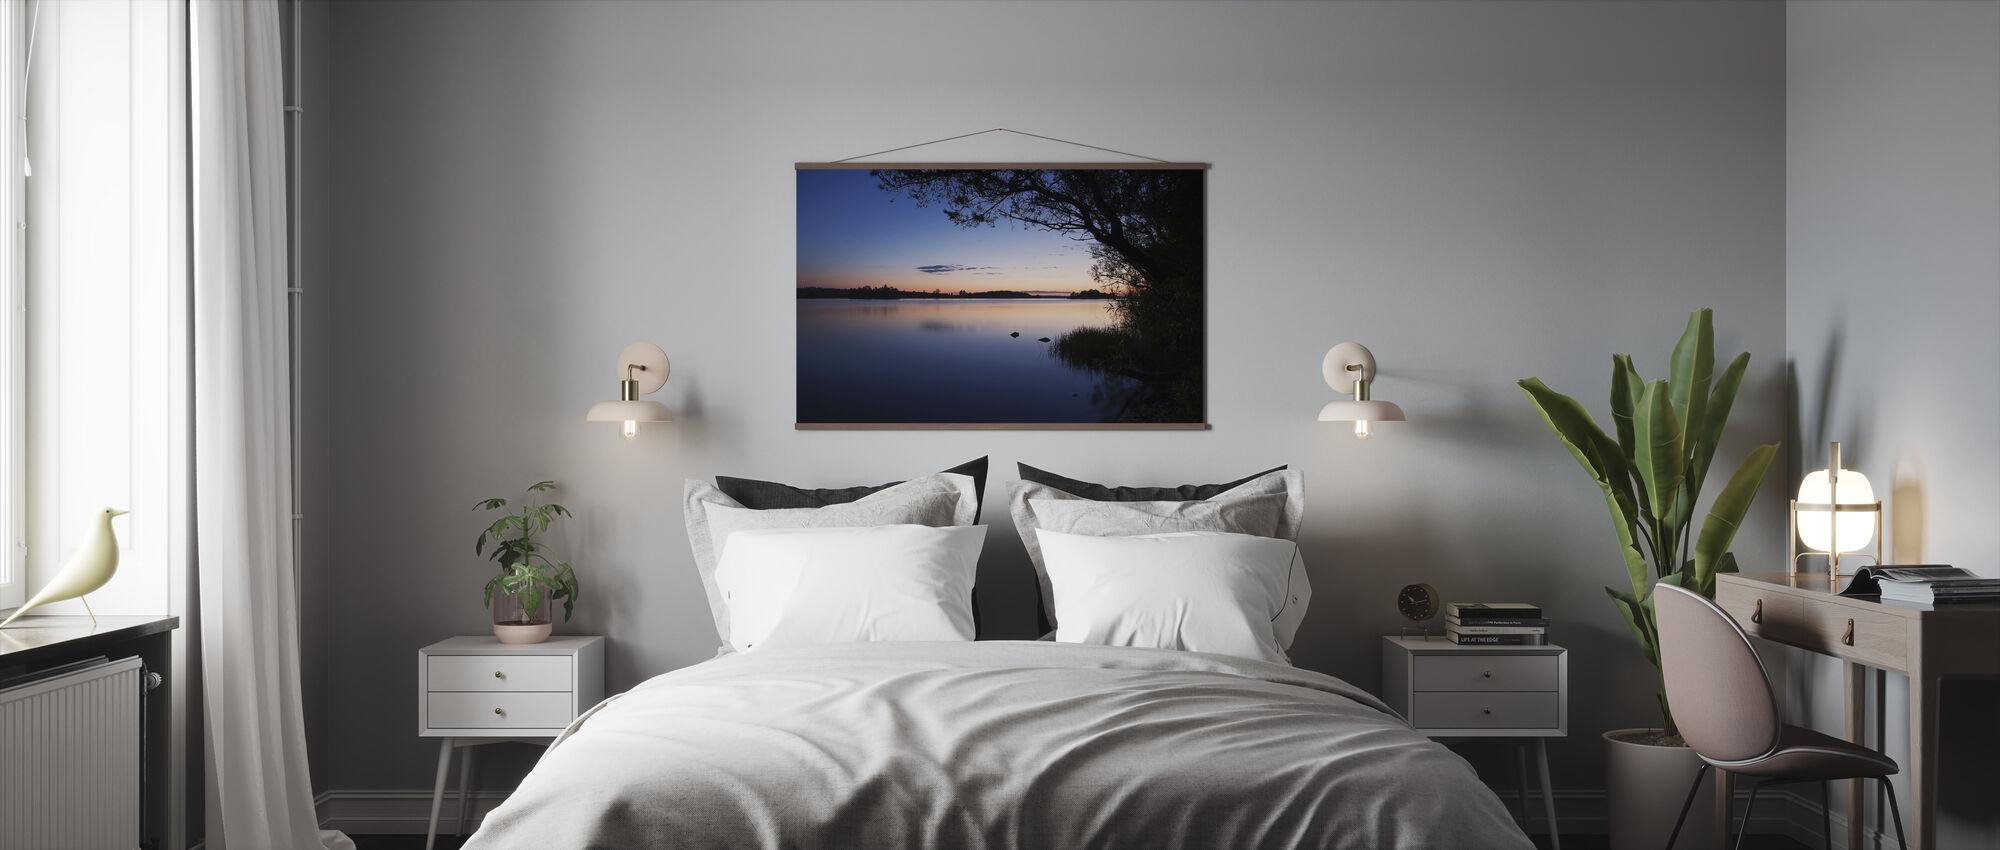 Blue Lake - Plakat - Soverom